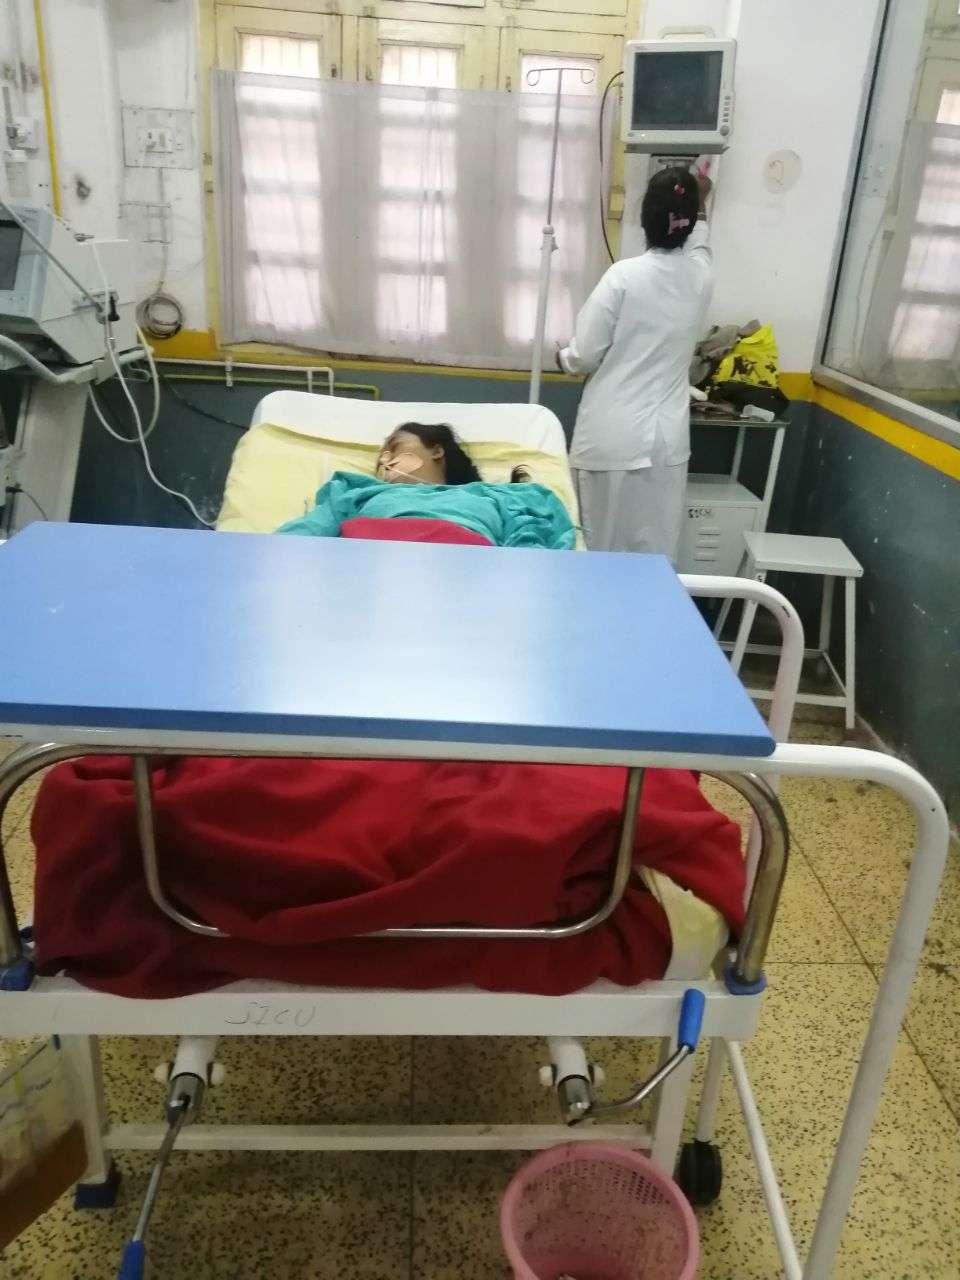 Newborn death of an unknown pregnant woman